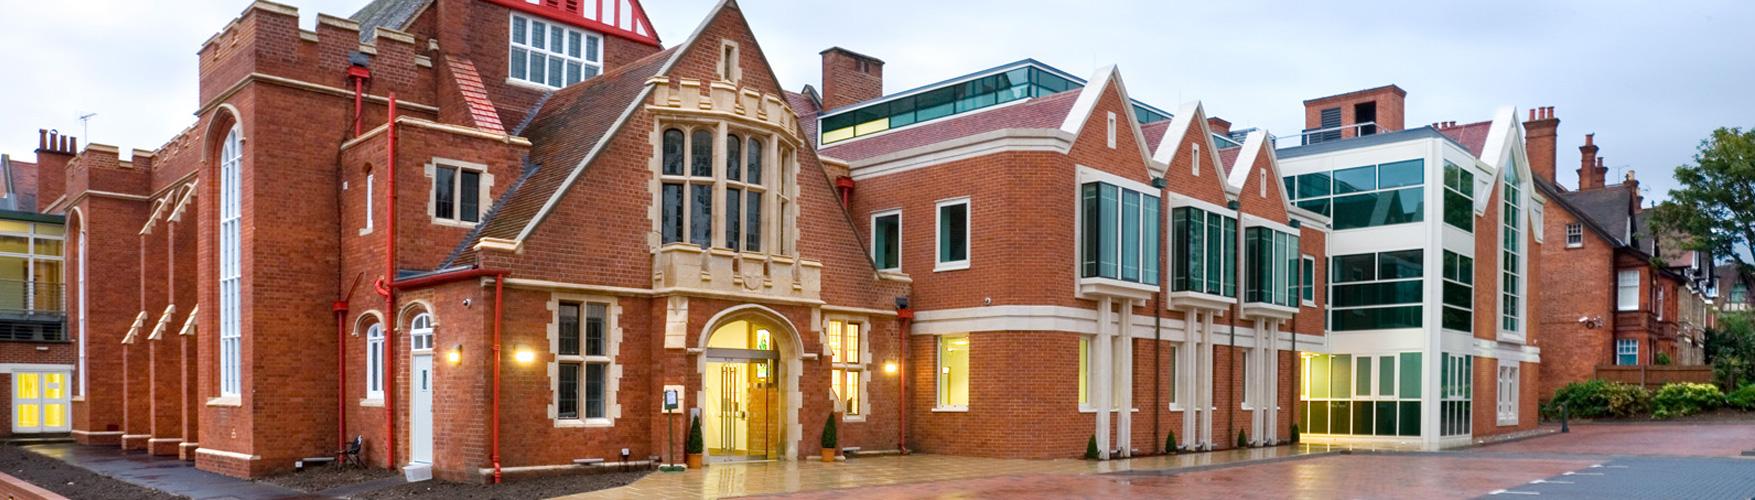 Entrepreneurial Mentoring at Abbey School, Reading